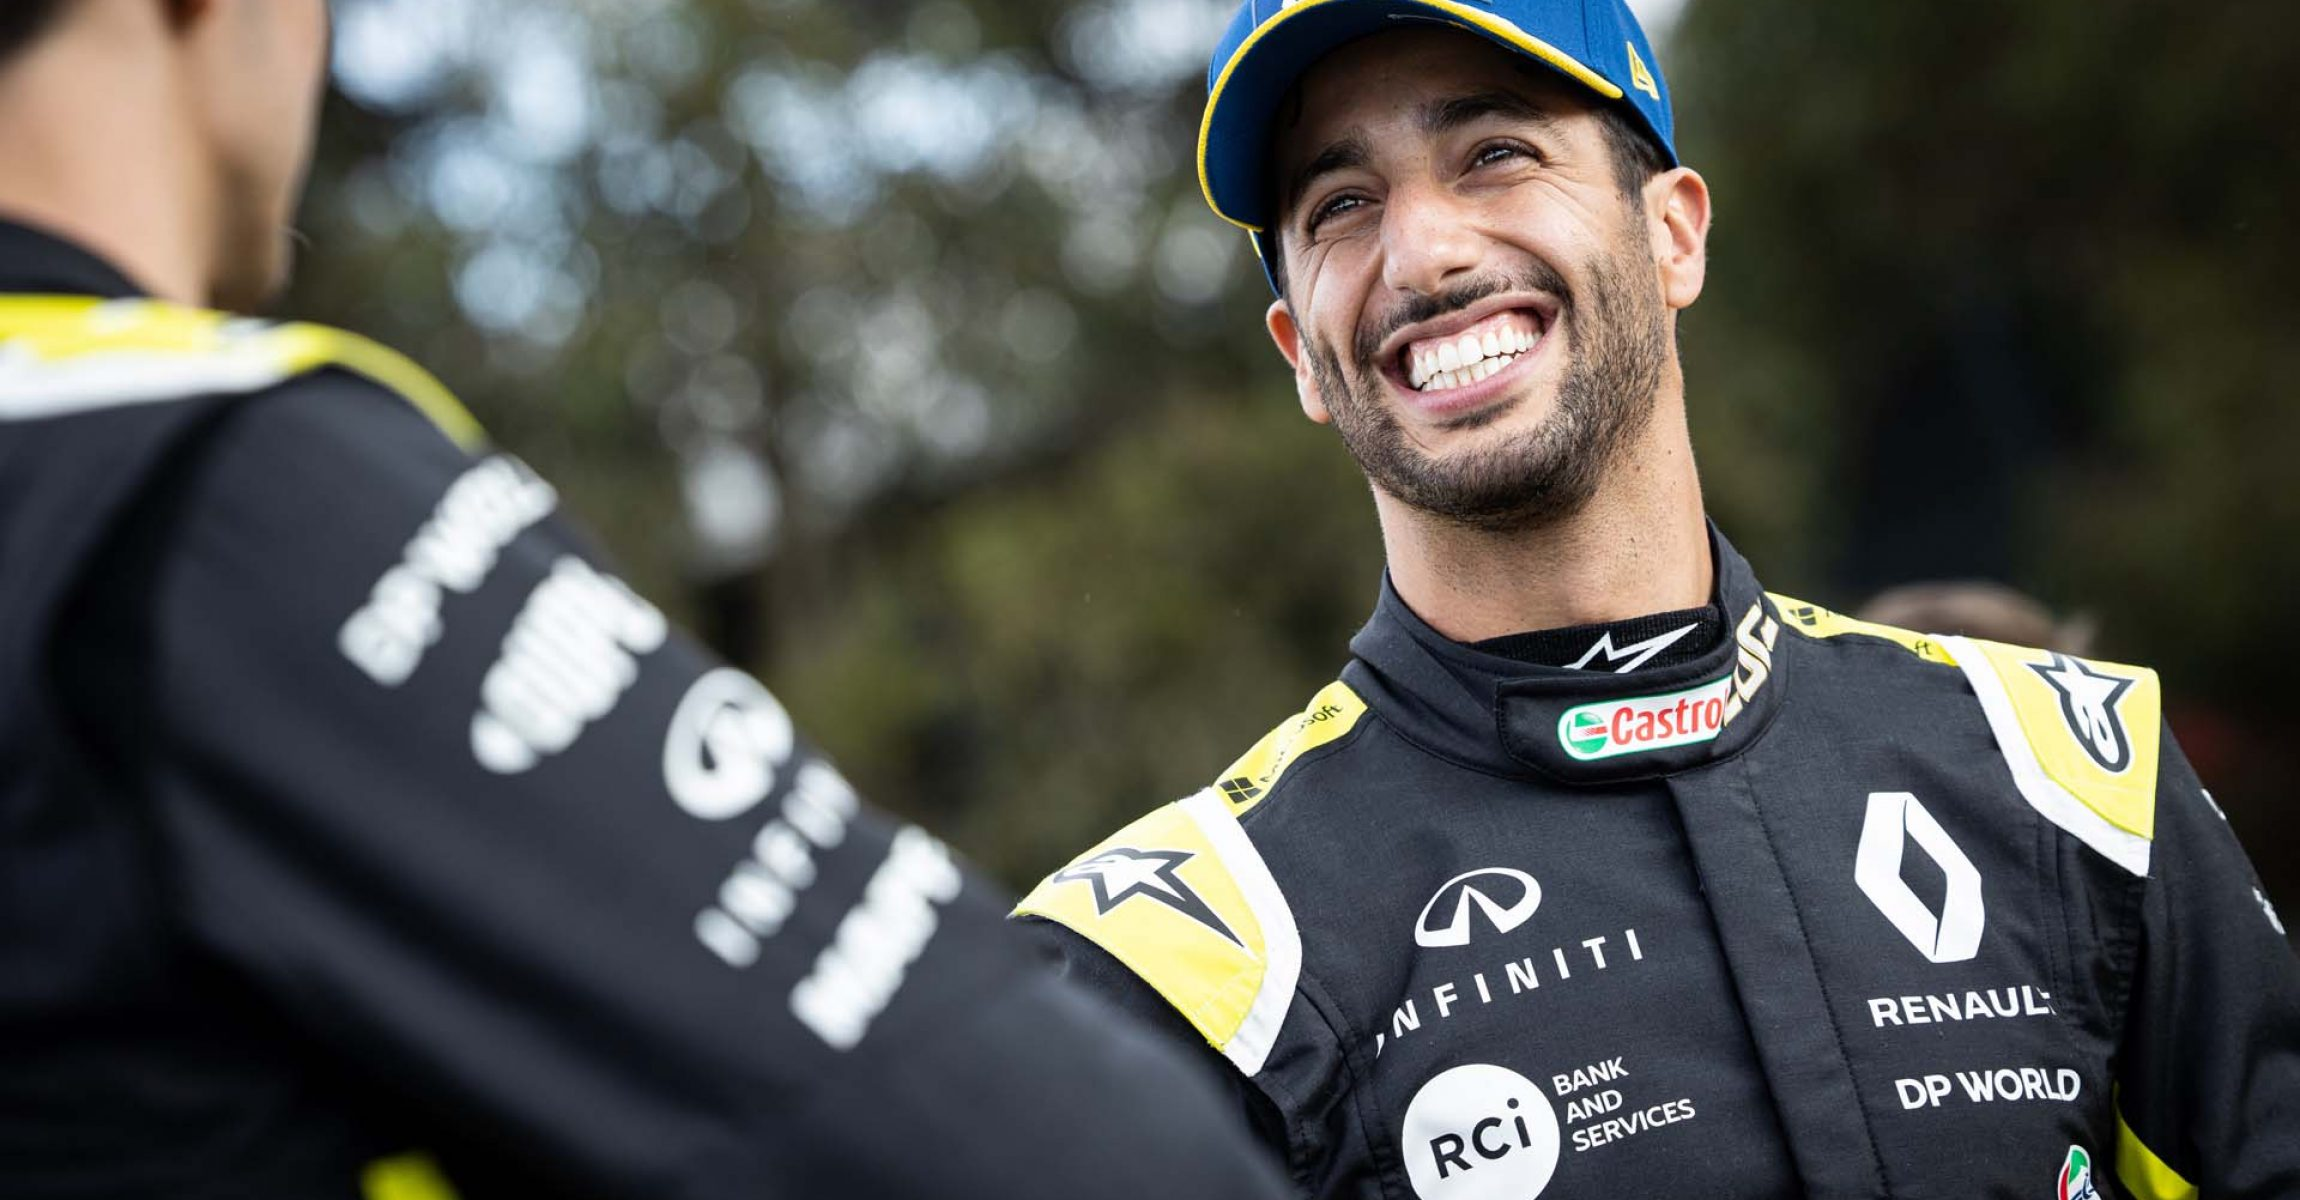 (L to R): Esteban Ocon (FRA) Renault F1 Team with Daniel Ricciardo (AUS) Renault F1 Team - livery reveal. Australian Grand Prix, Wednesday 11th March 2020. Albert Park, Melbourne, Australia.